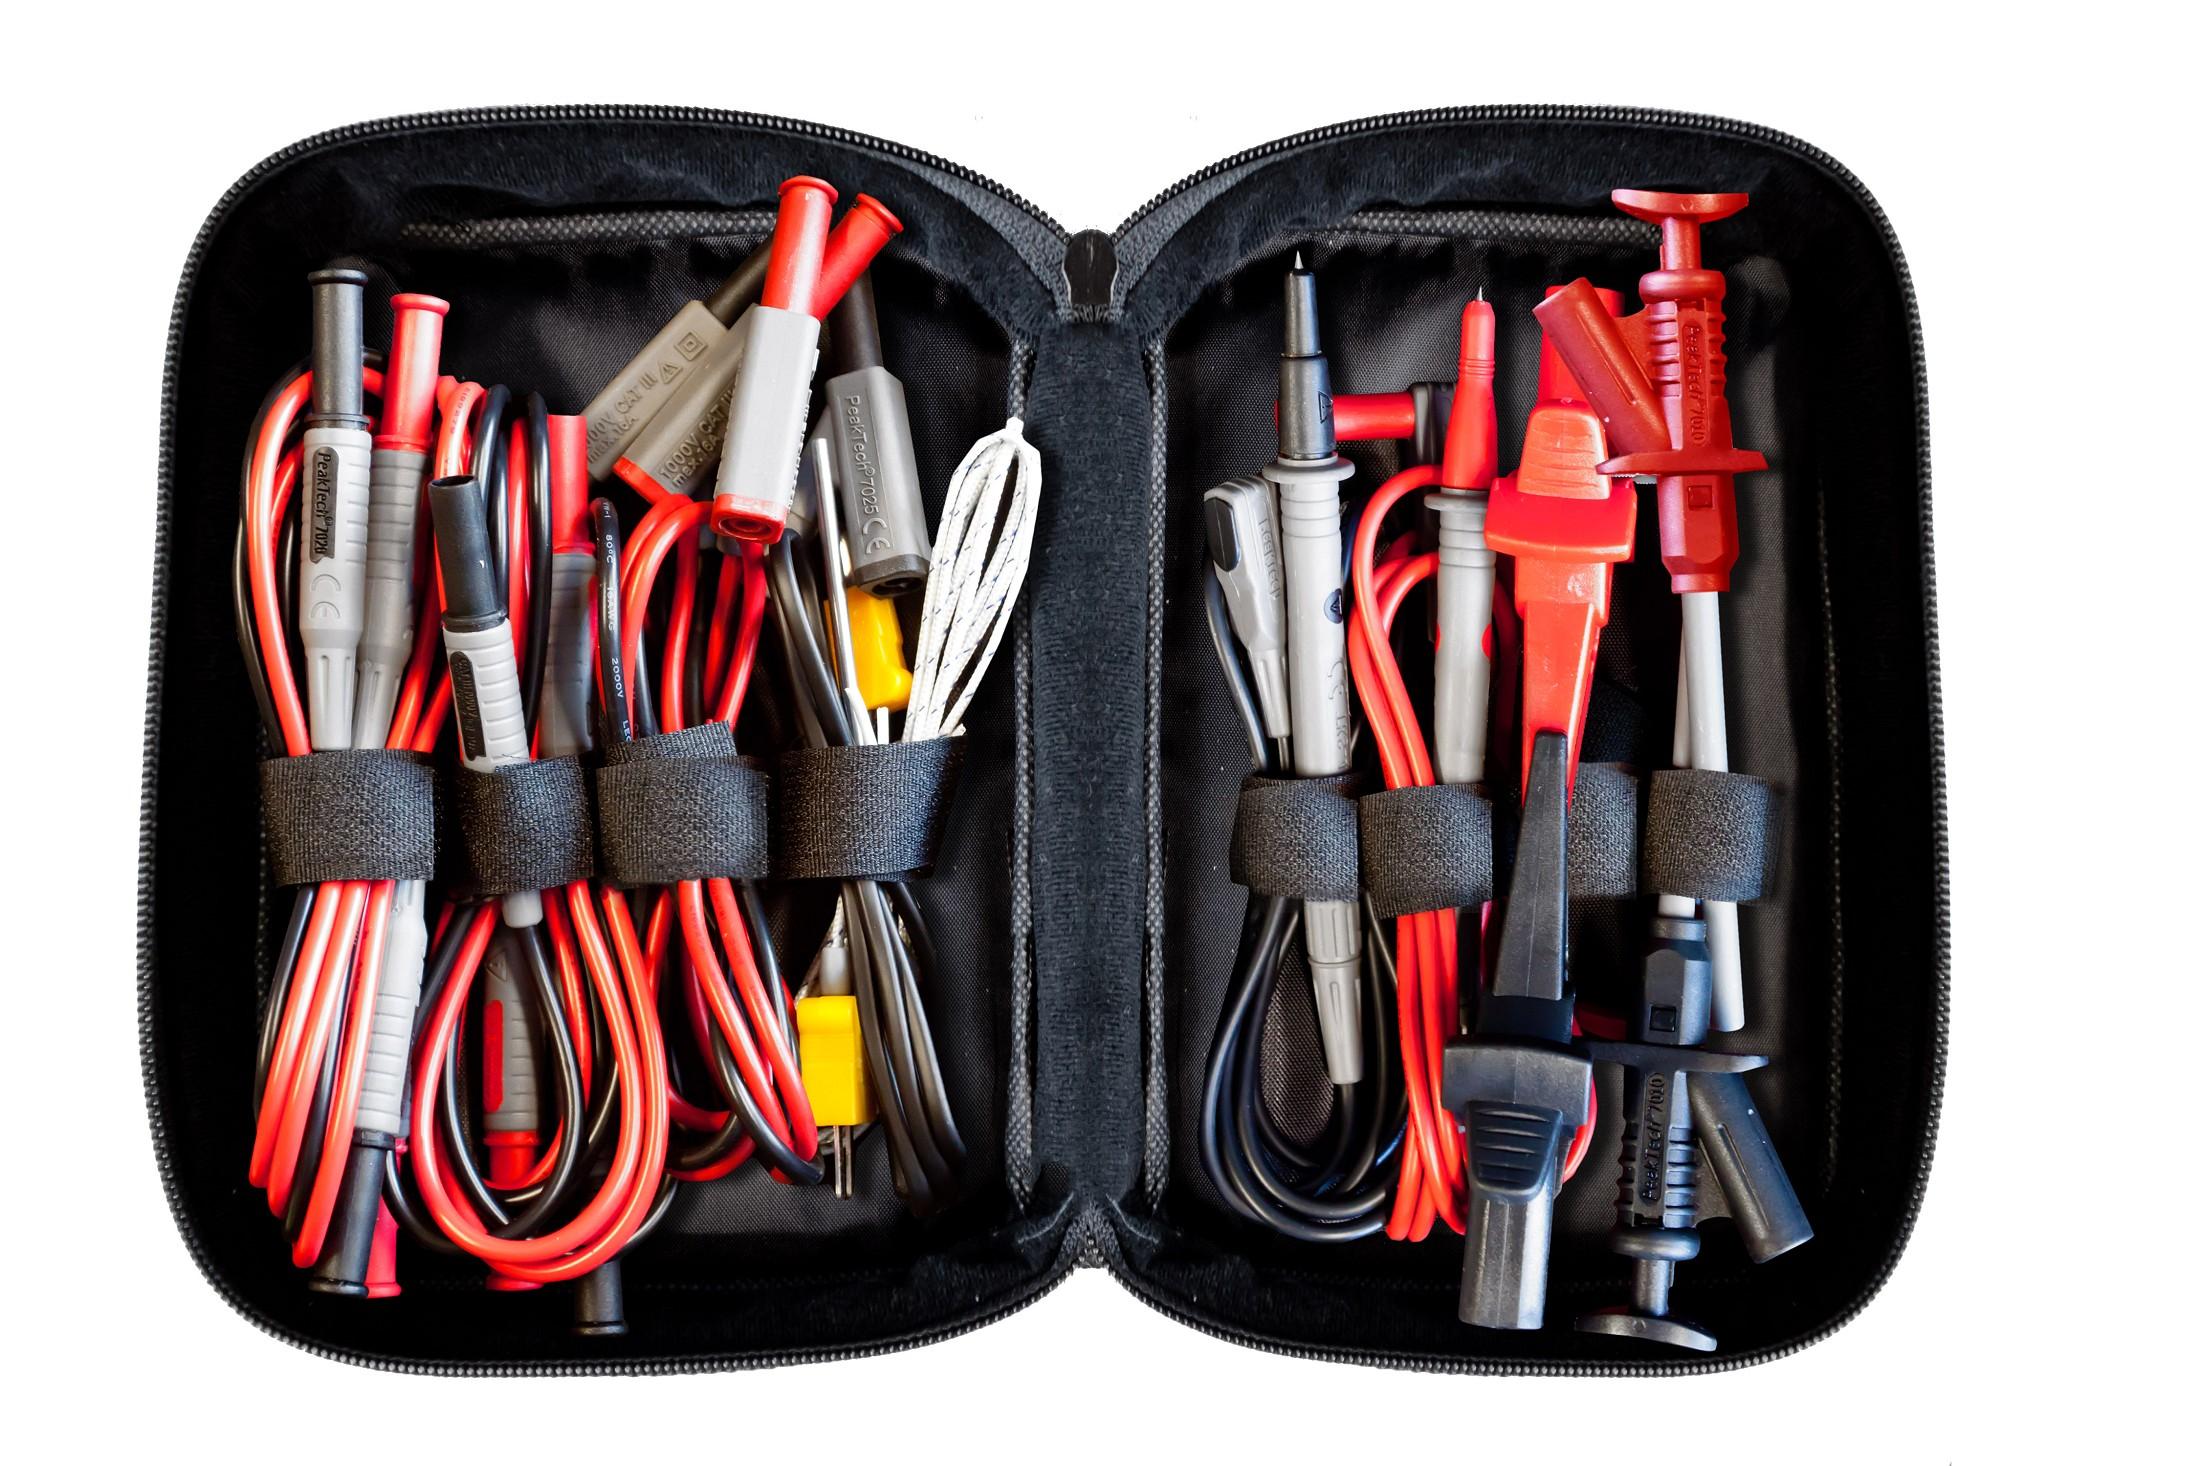 «PeakTech® P 8200» Measuring Accessories Set